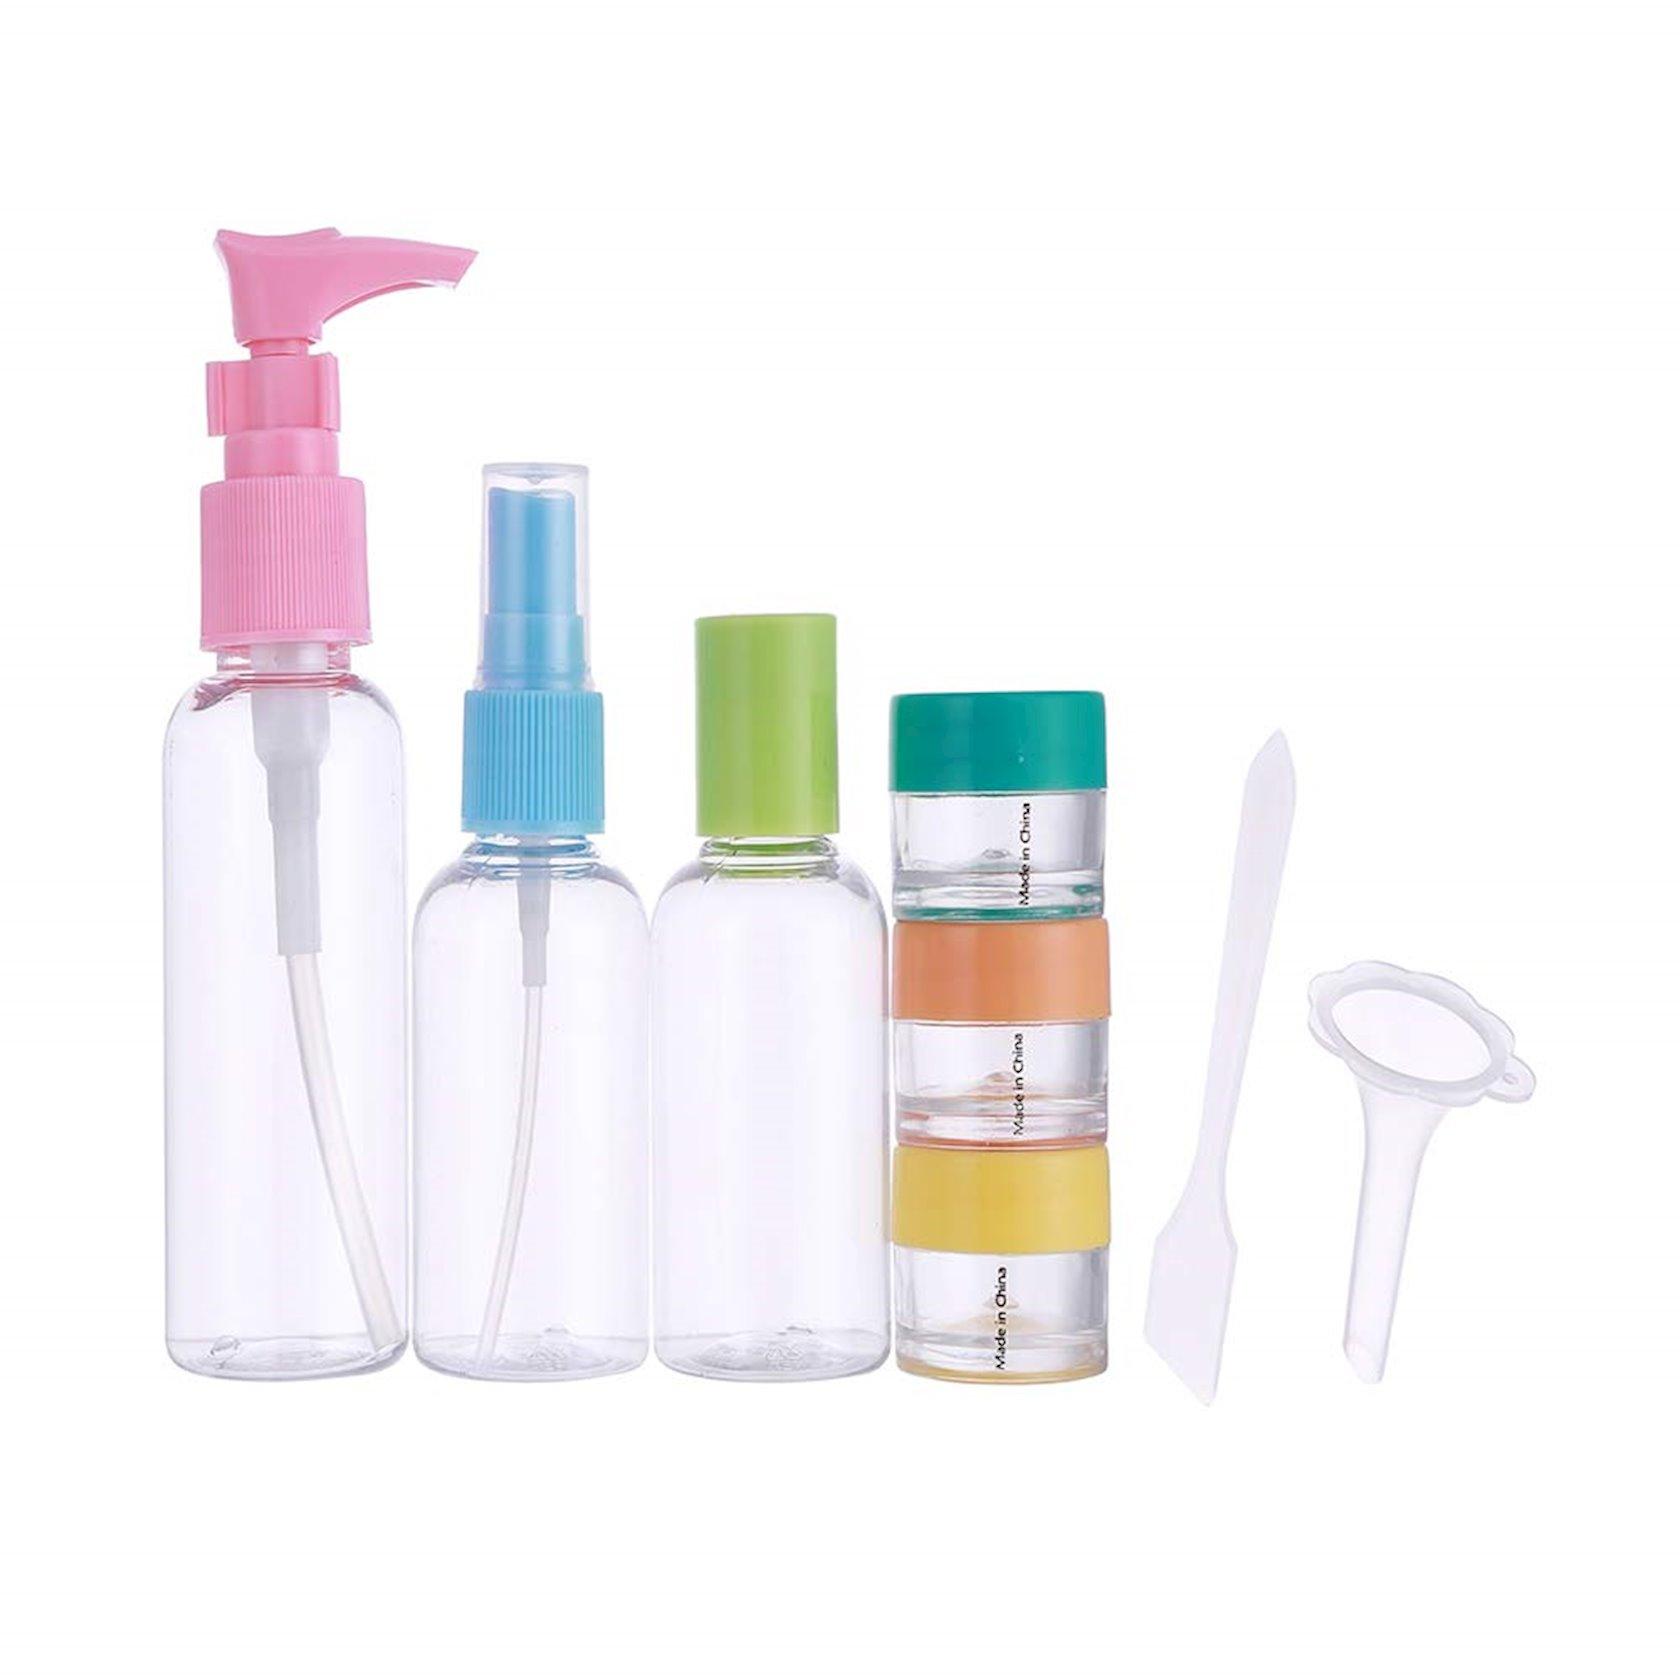 Səyahət dəsti Miniso Colorful Traveling Bottle Set, 8 əşya